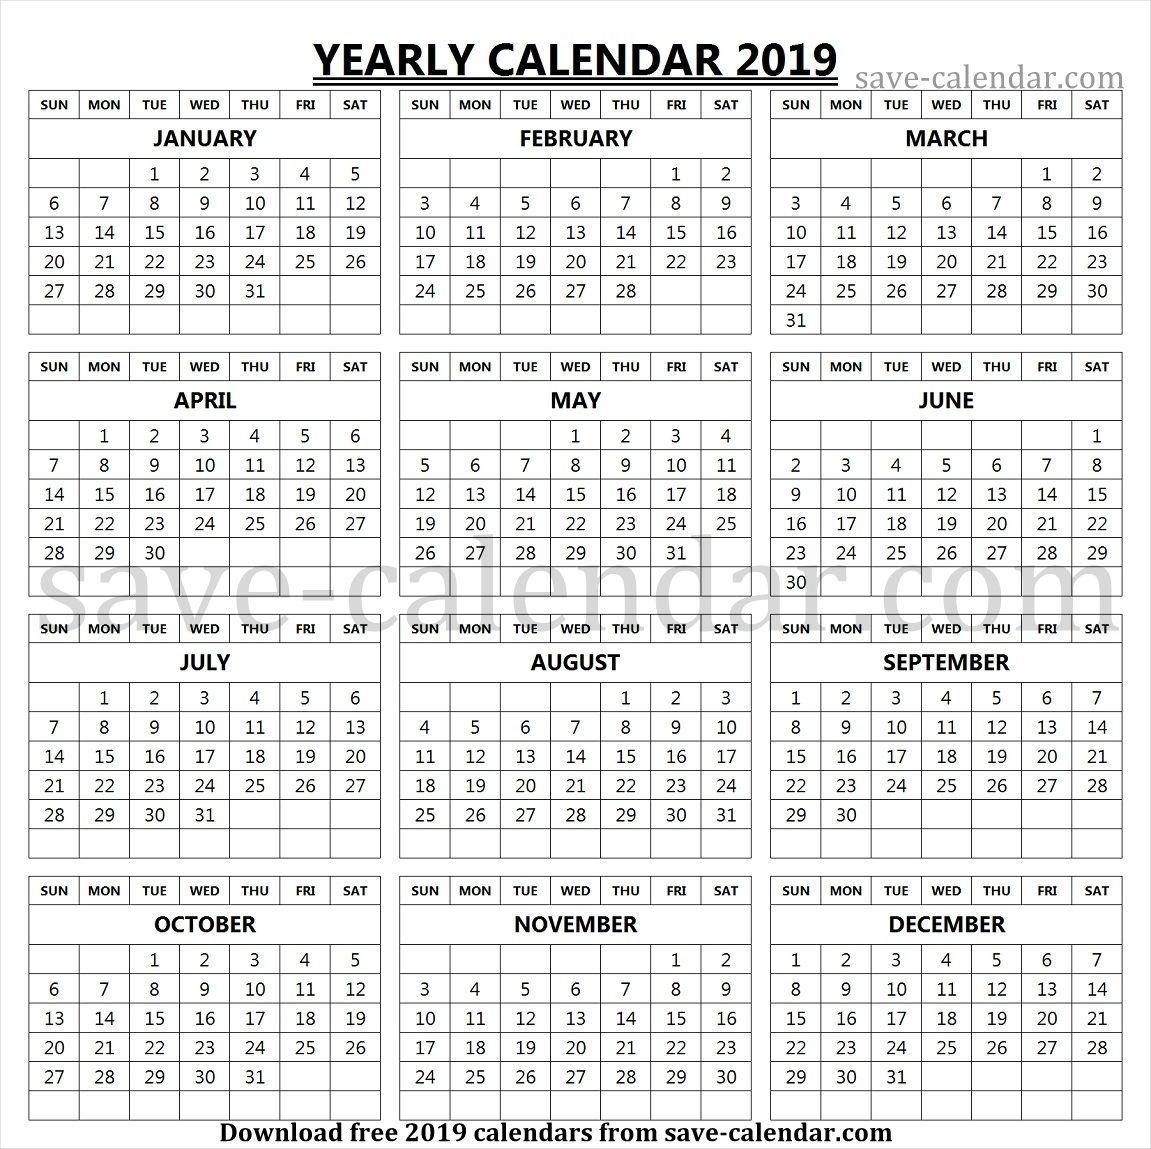 Printable 2019 Calendar Vertical List | Yearly Calendar 2019